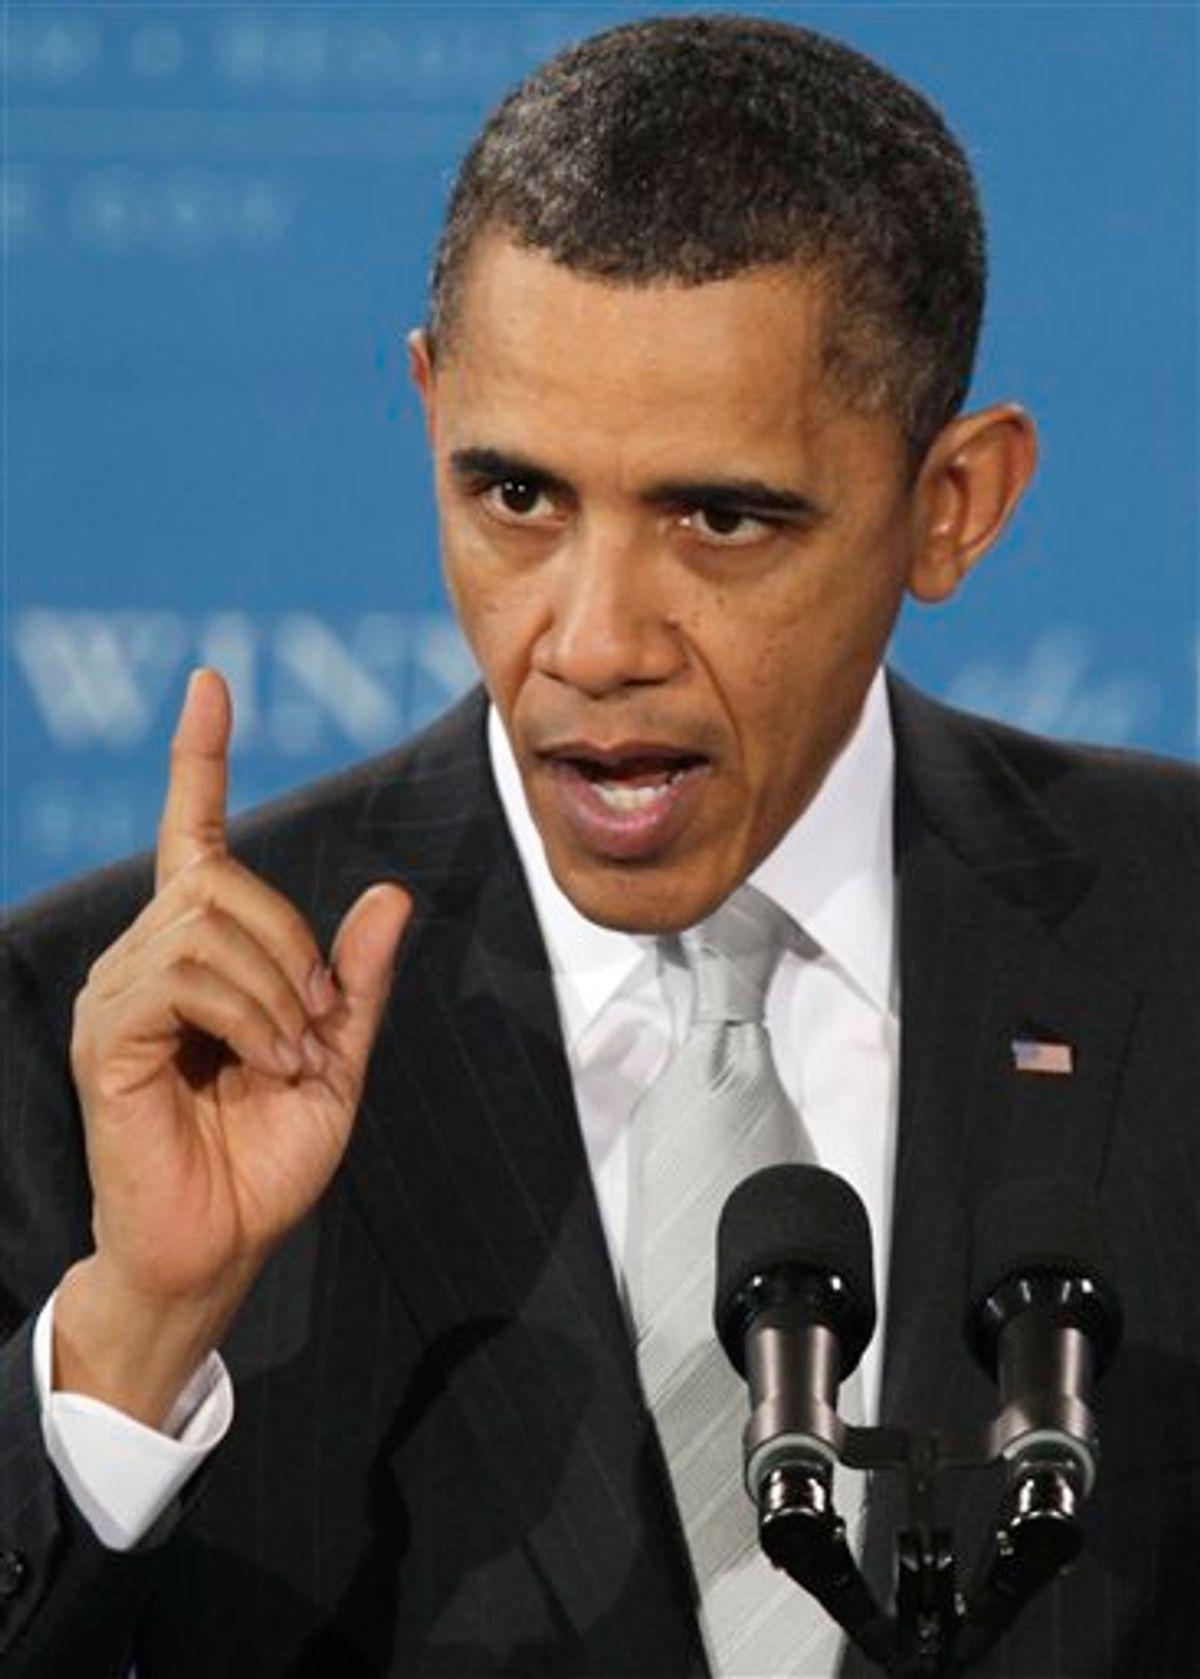 President Barack Obama speaks at Kenmore Middle School in Arlington, Va., Monday, March 14, 2011. (AP Photo) (AP)